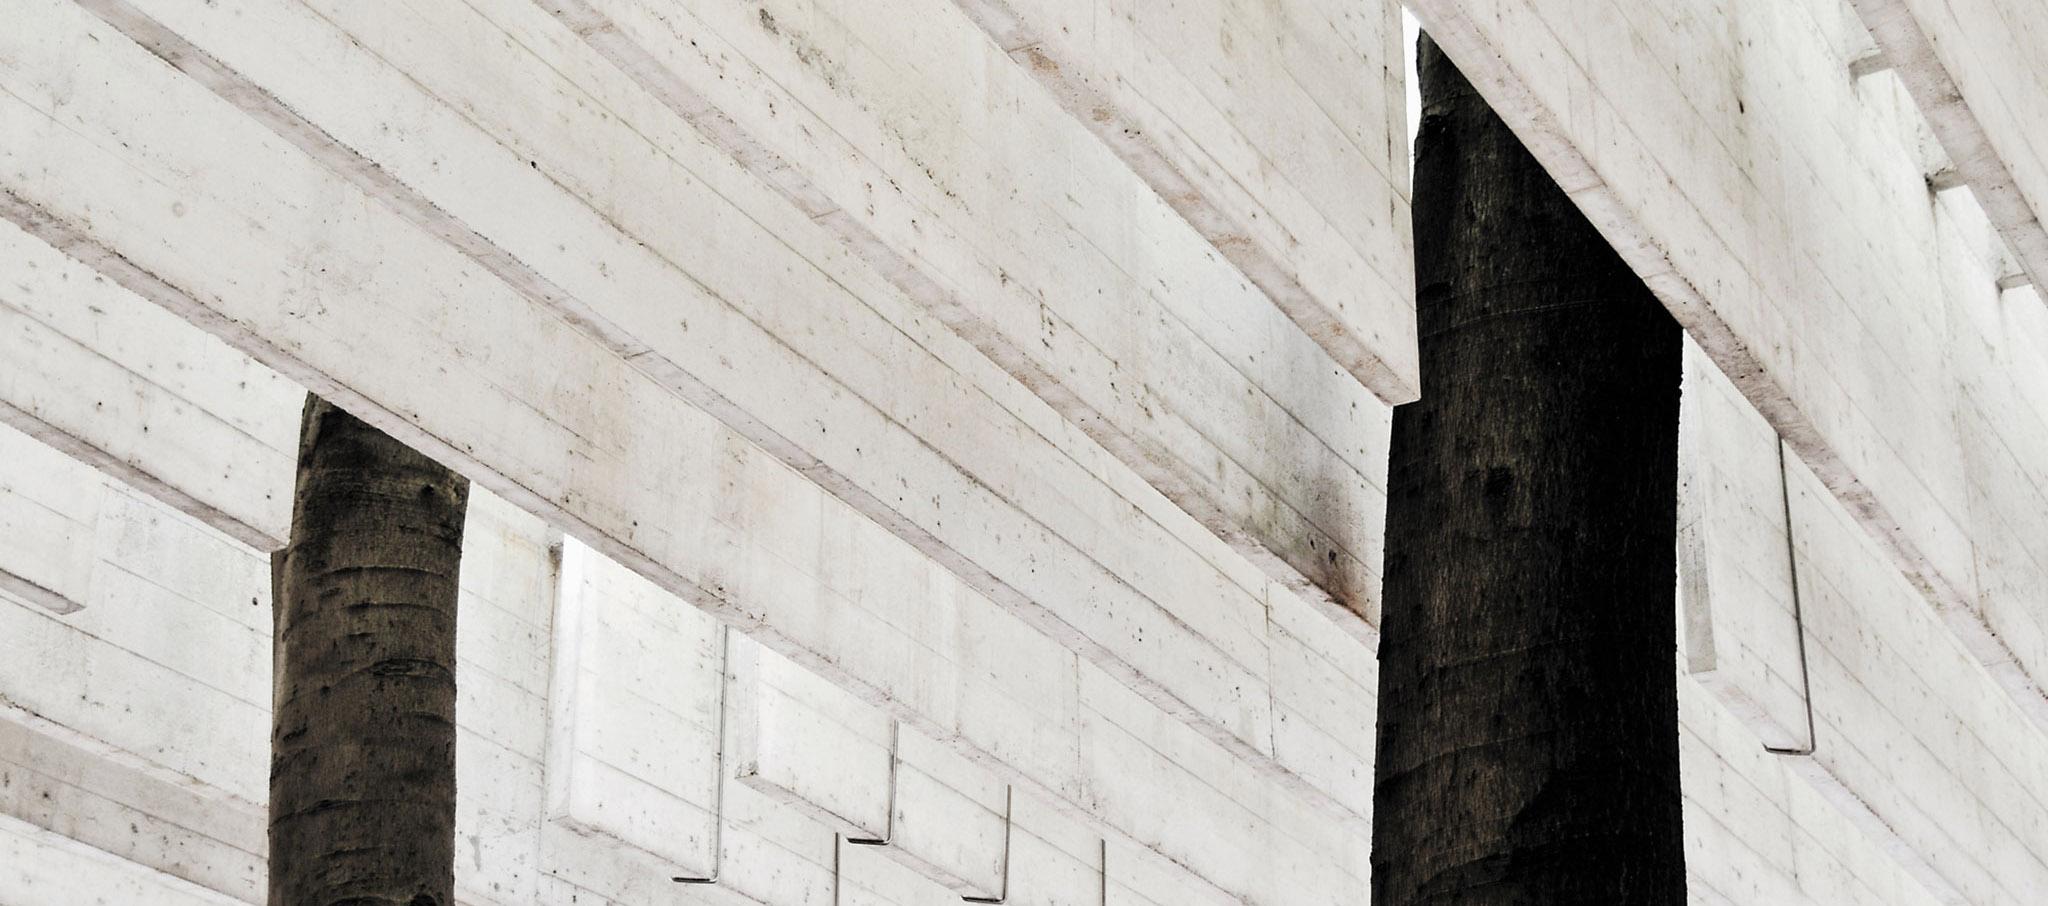 Detail. Nordic Pavilion, Venice. Photograph by Maurizio Mucciola